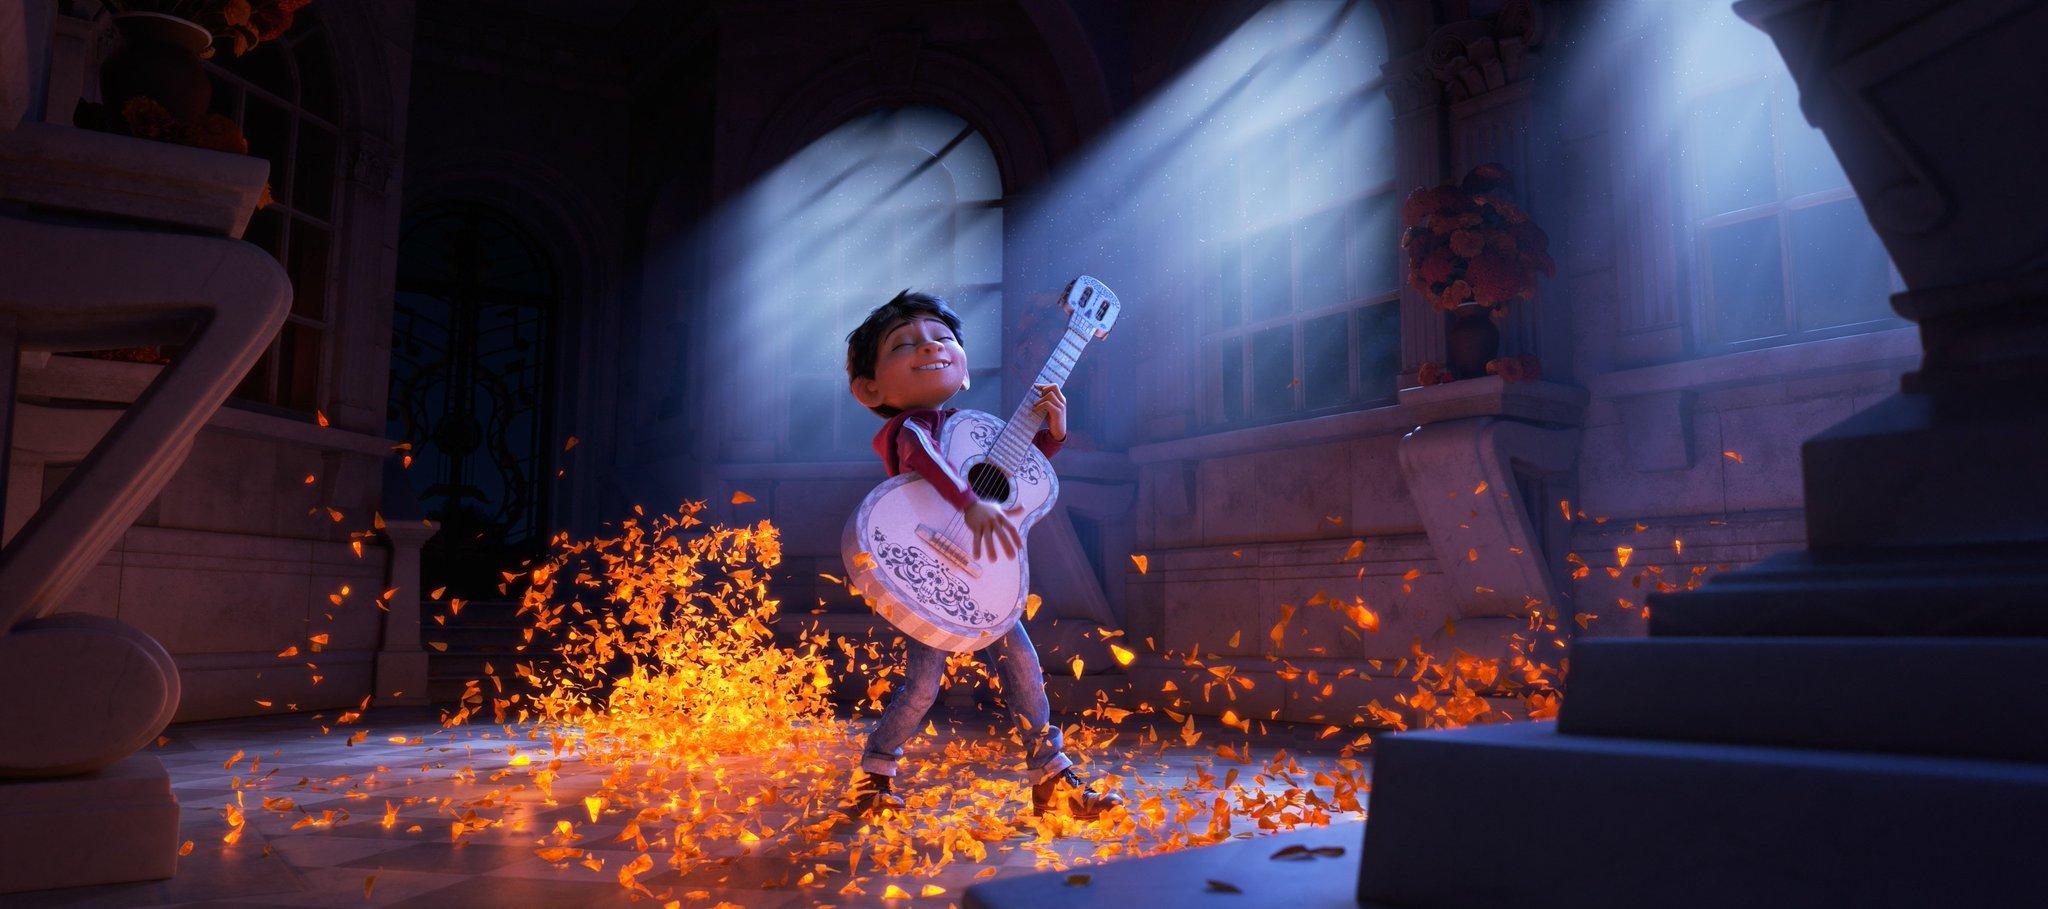 Disney•Pixar's Coco Trailer Unveiled